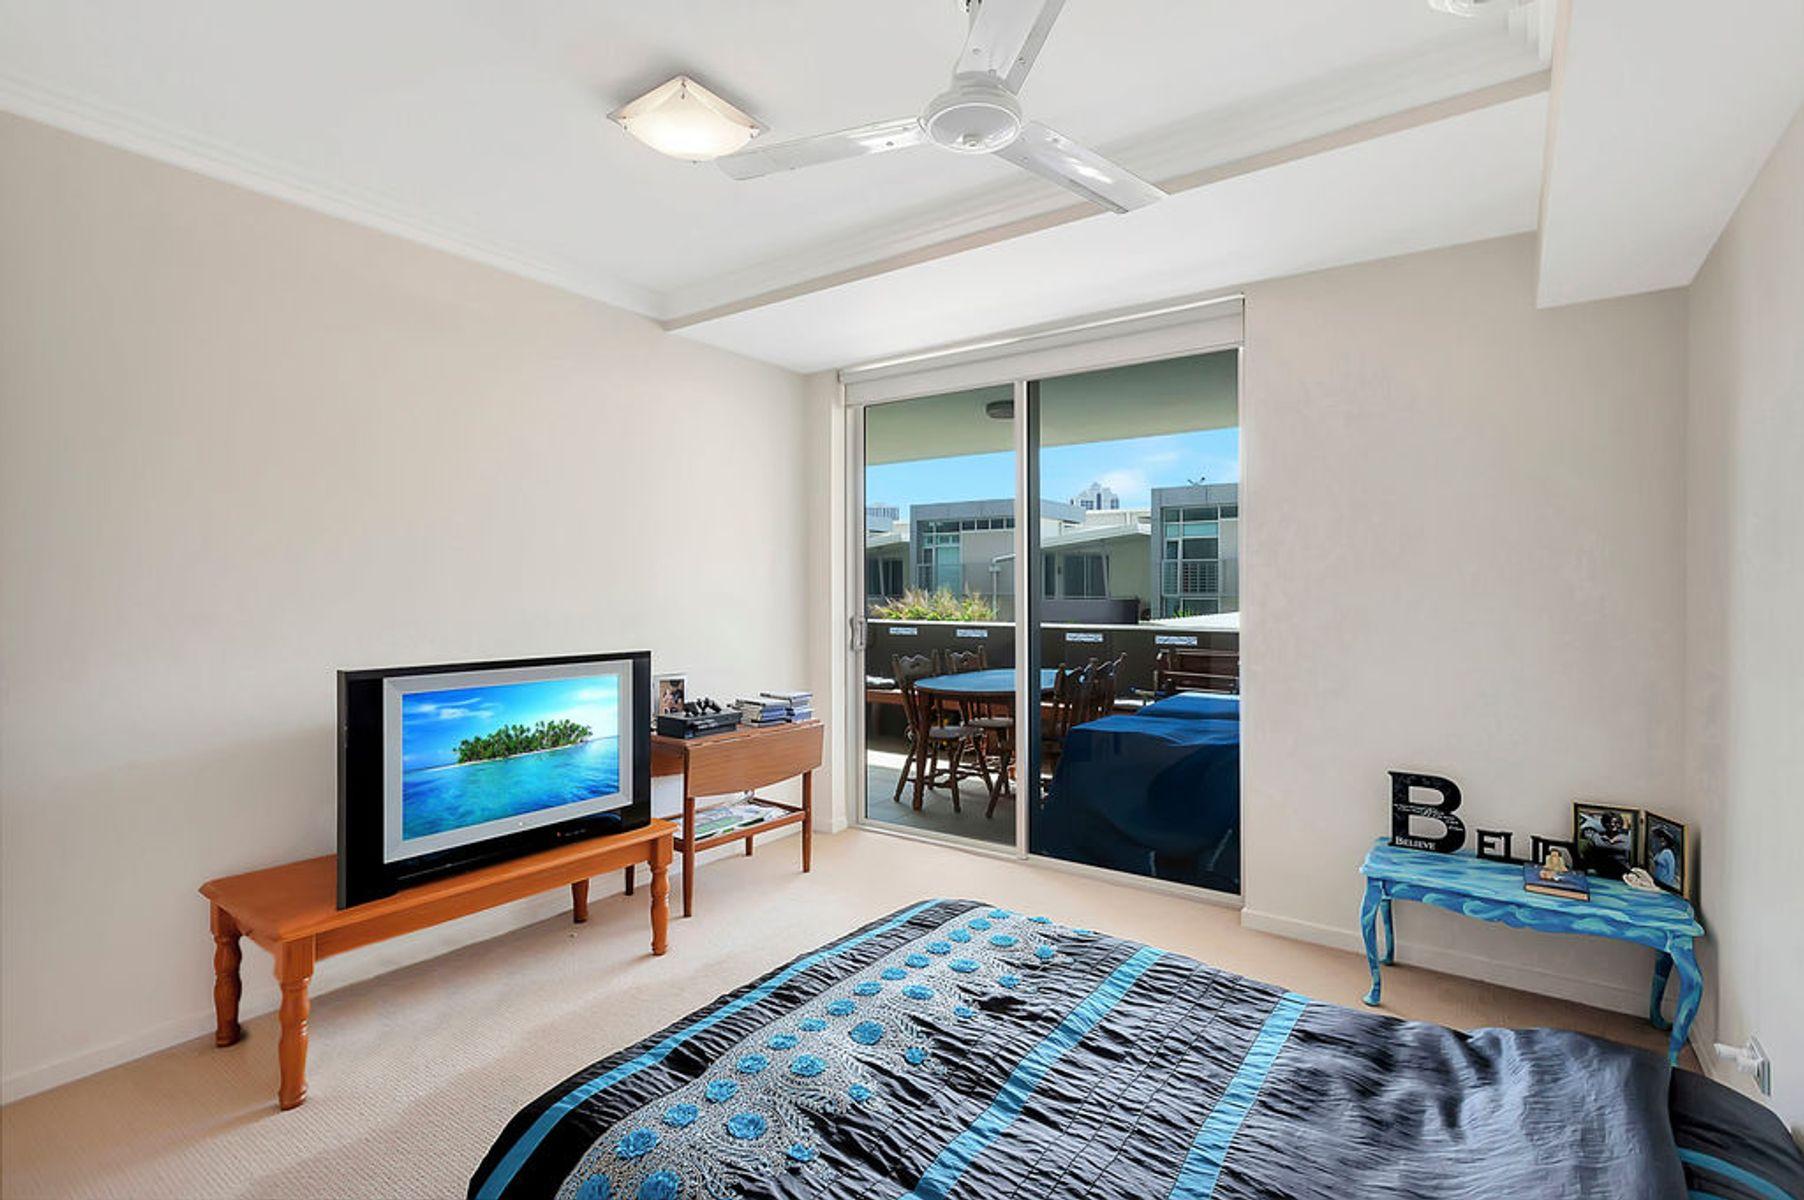 17/53 DARRAMBAL STREET, Surfers Paradise, QLD 4217